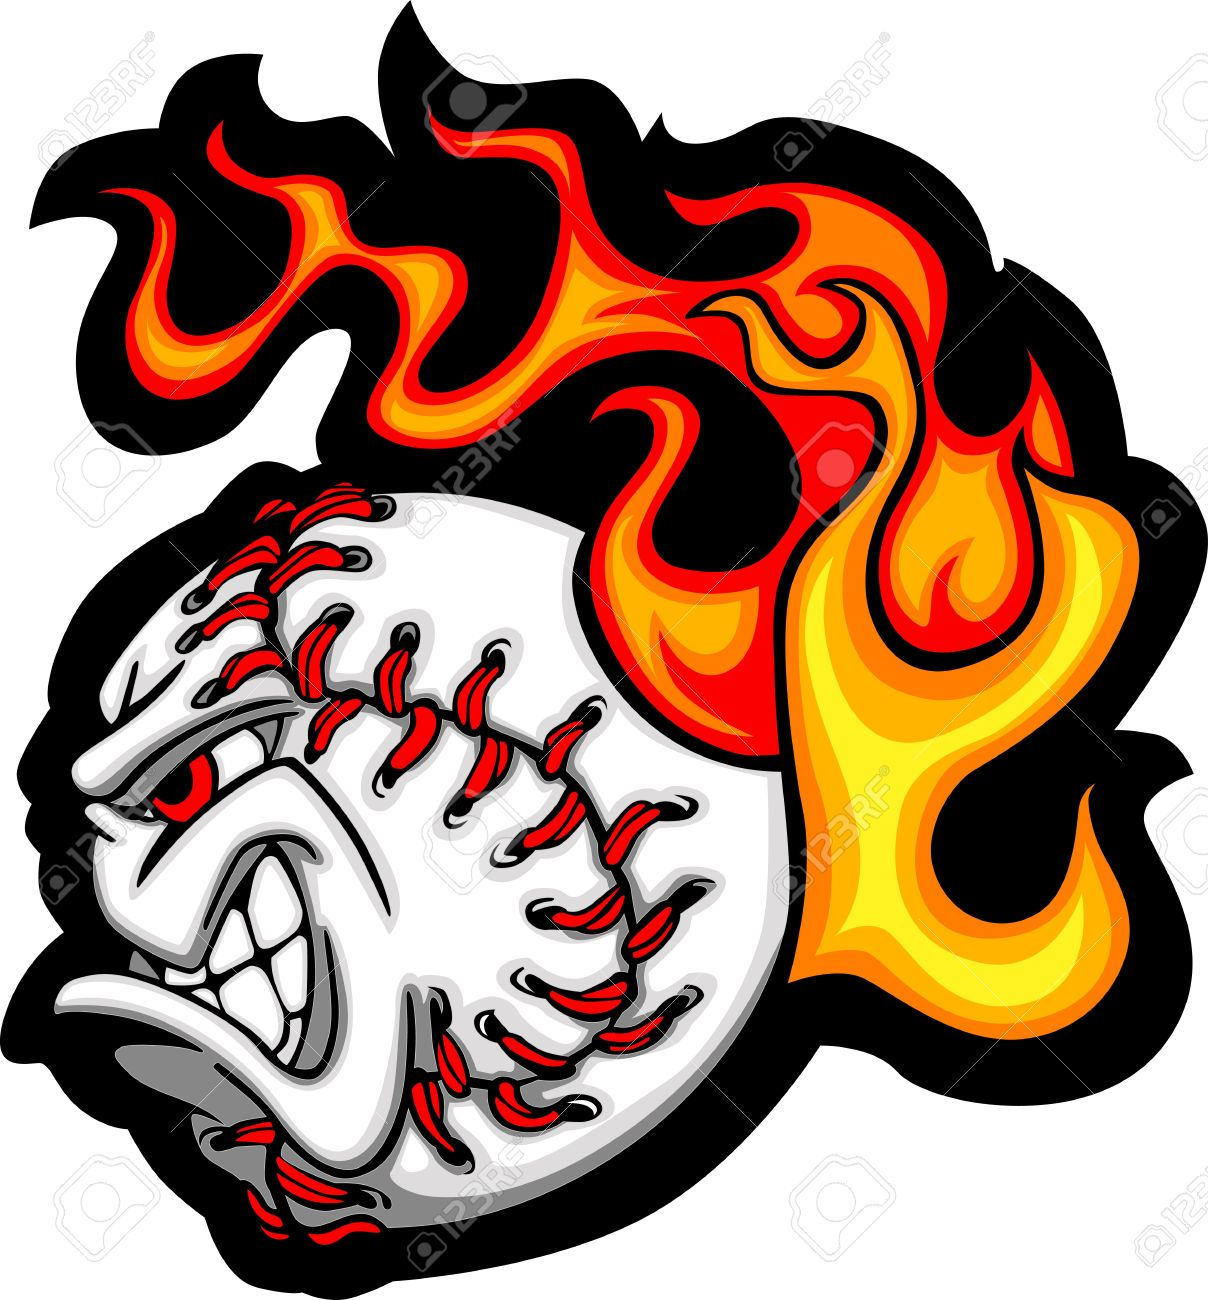 softball or baseball face